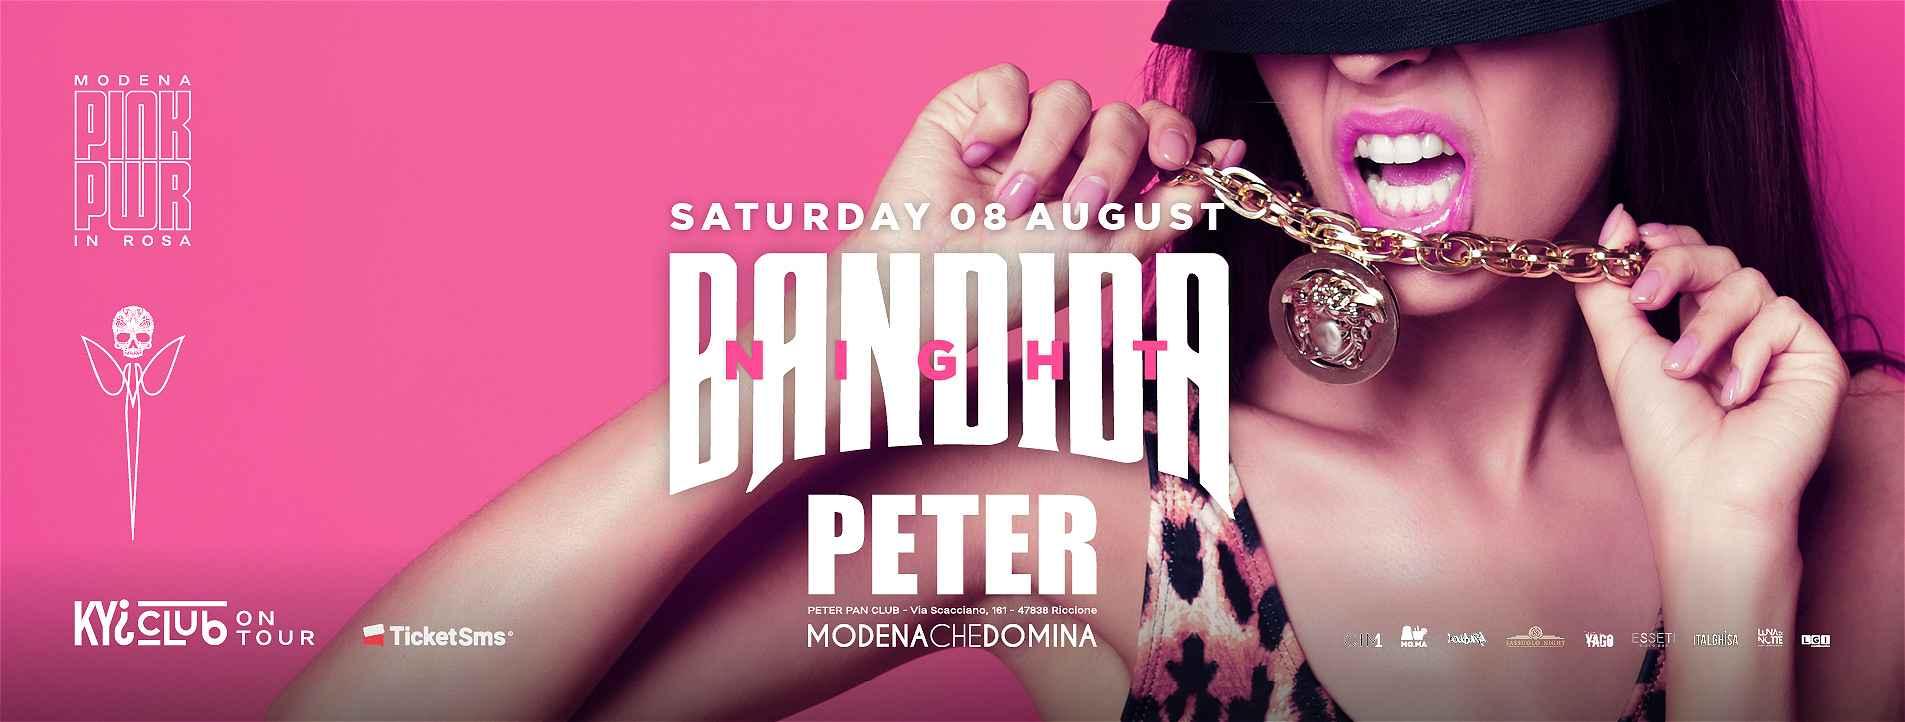 bandida night peter sabato 8 agosto